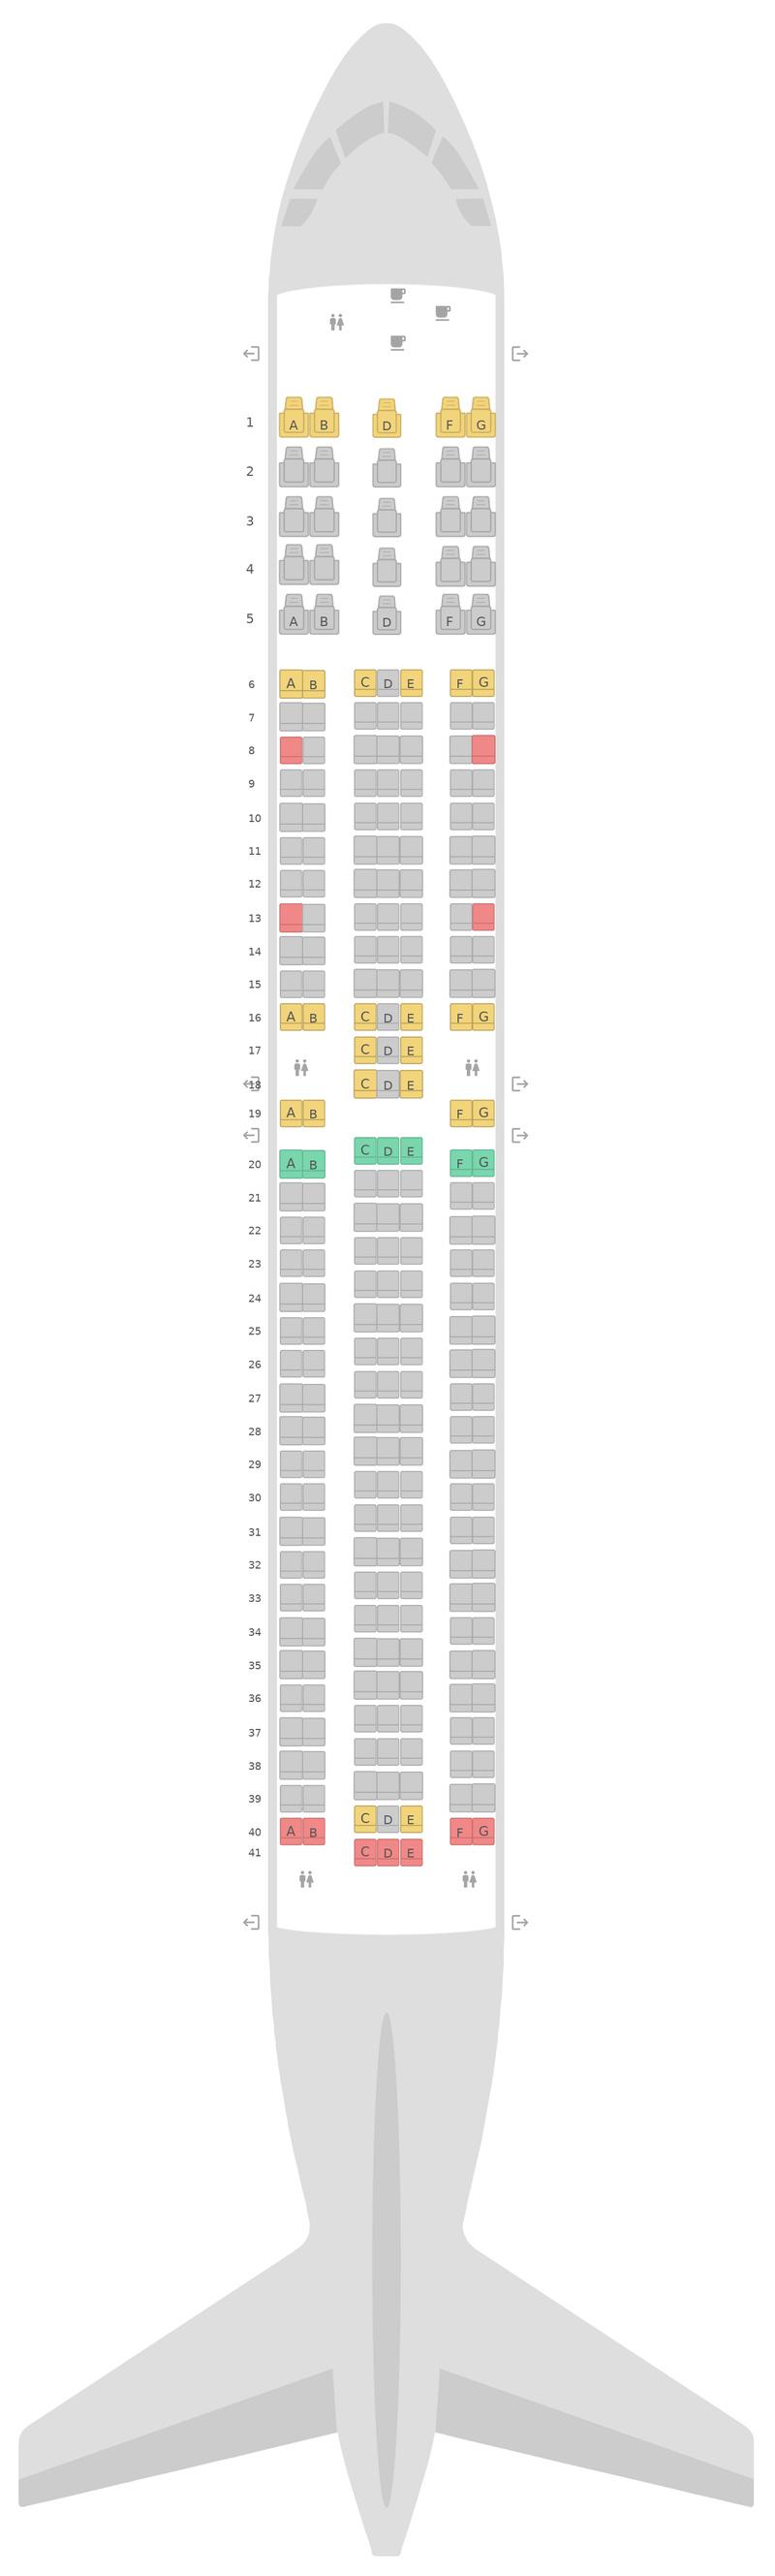 Mapa de asientos Boeing 767-300ER Icelandair